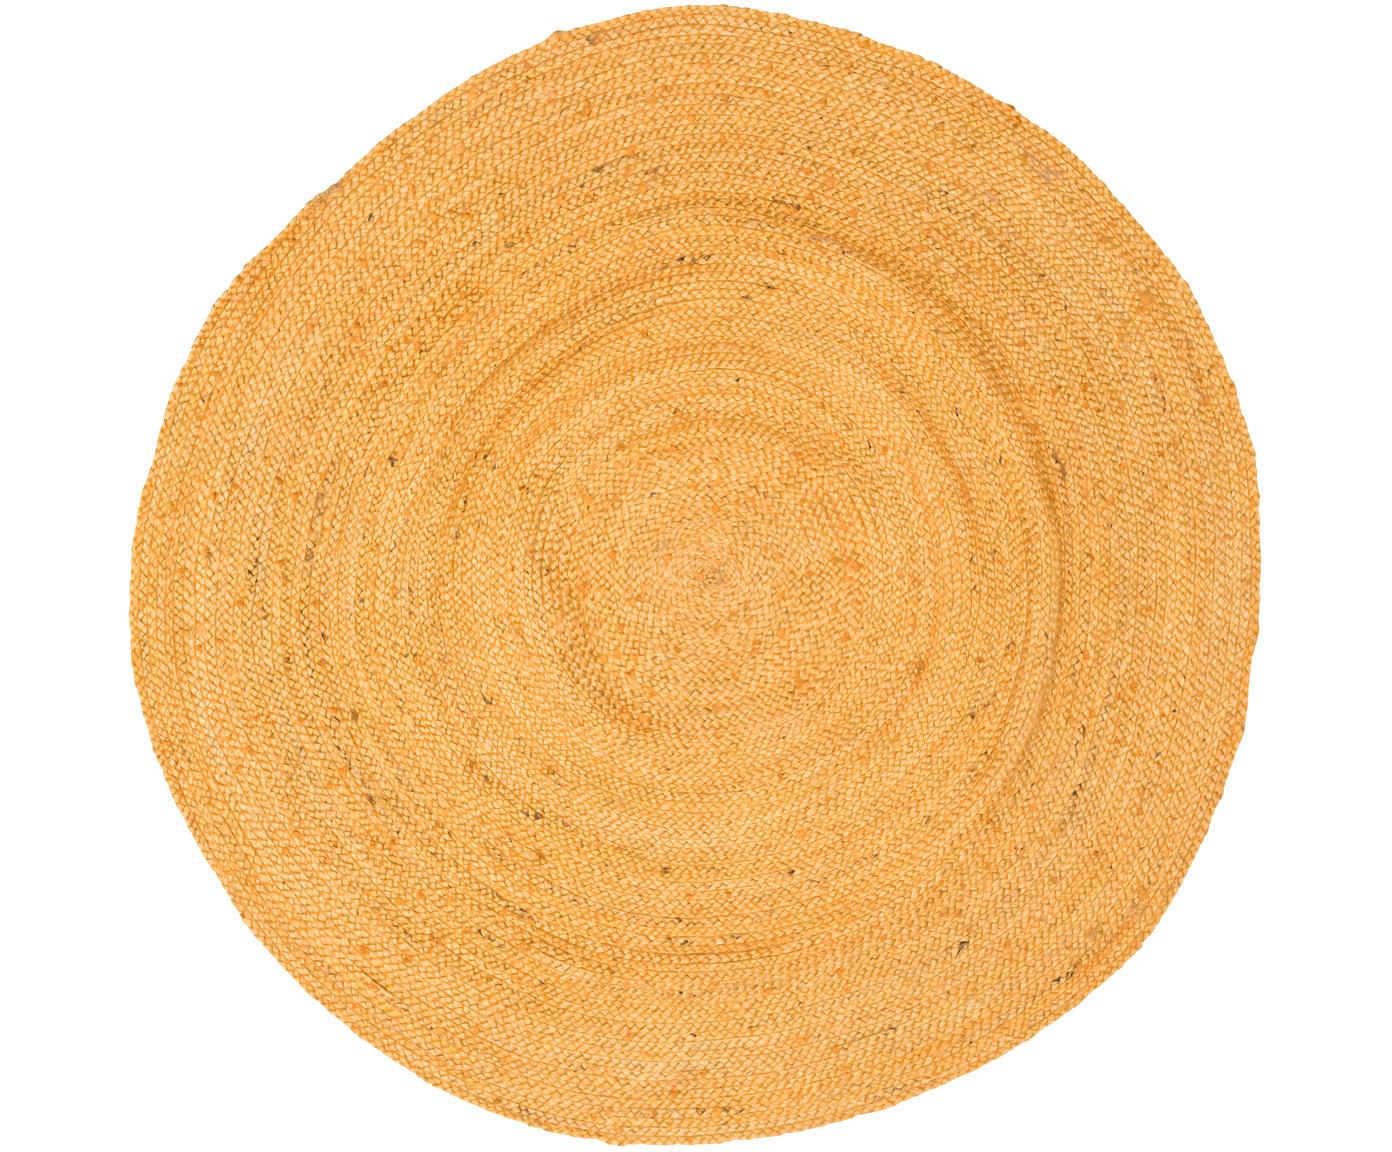 Tappeto rotondo in juta giallo Pampas, Juta, Giallo, Ø 150 cm (taglia M)